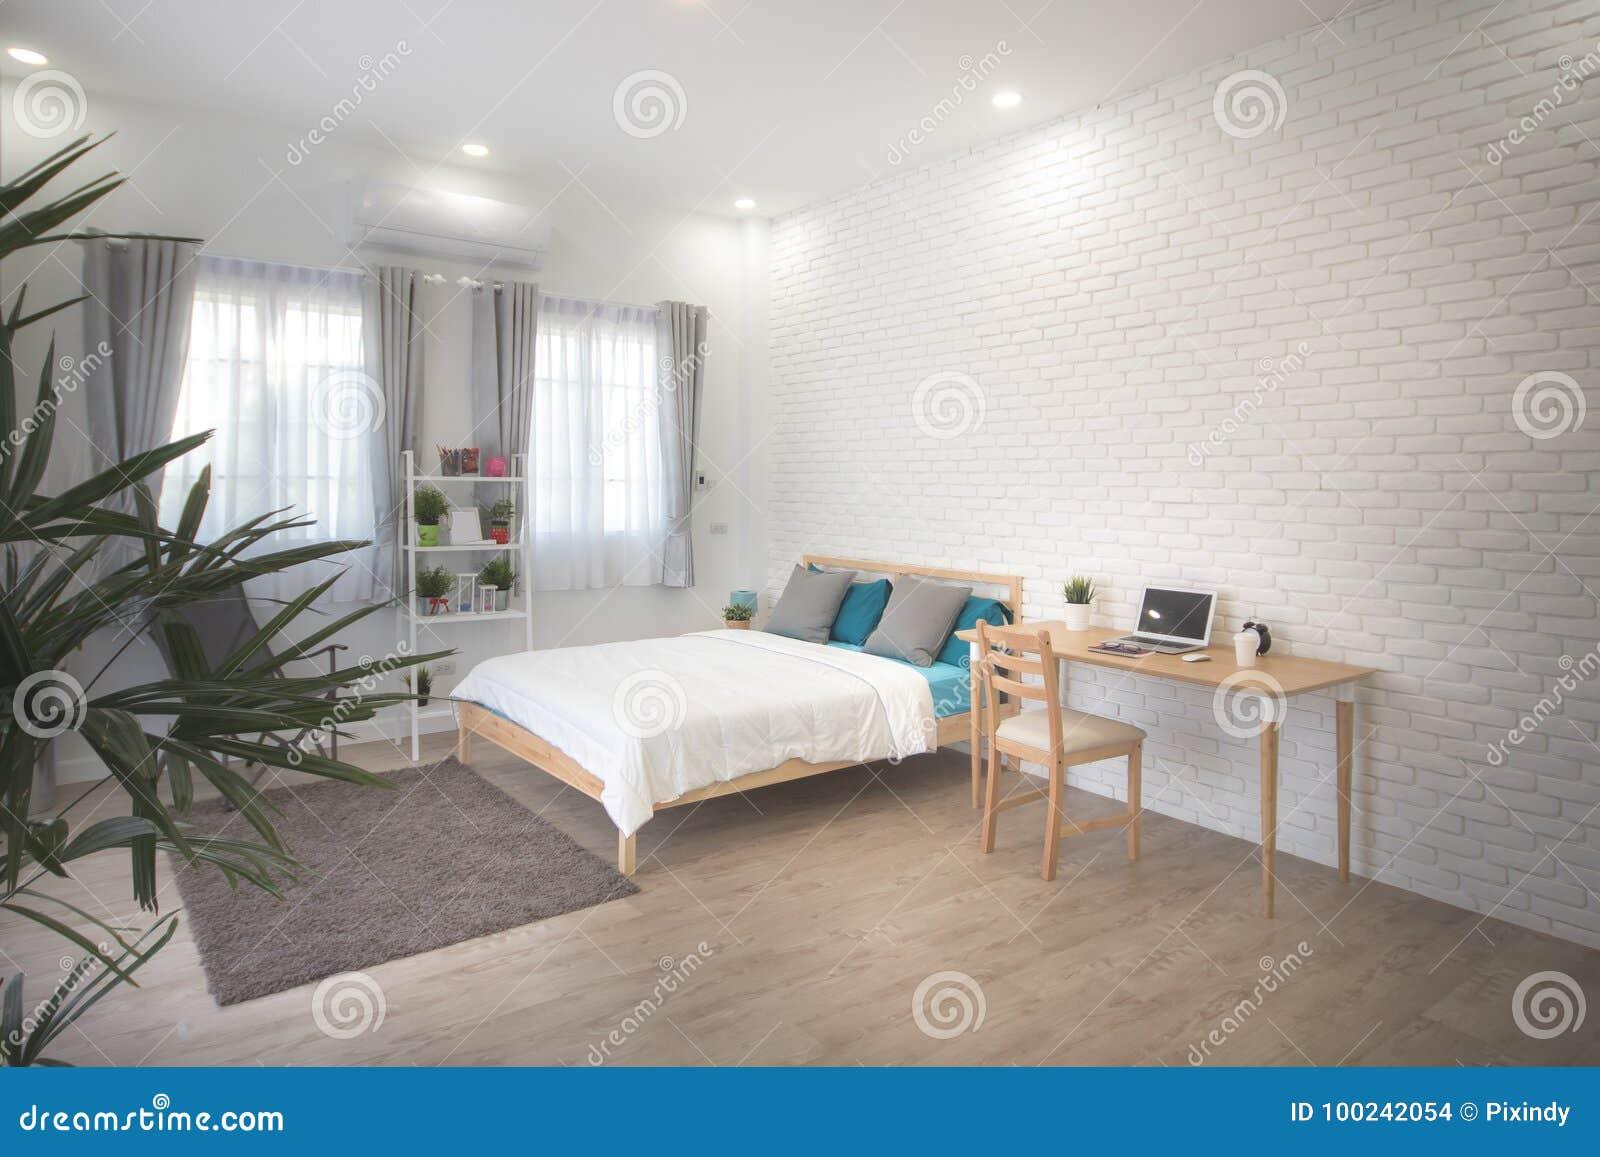 Hotel bedroom interior design. White bedroom setting studio for rent.